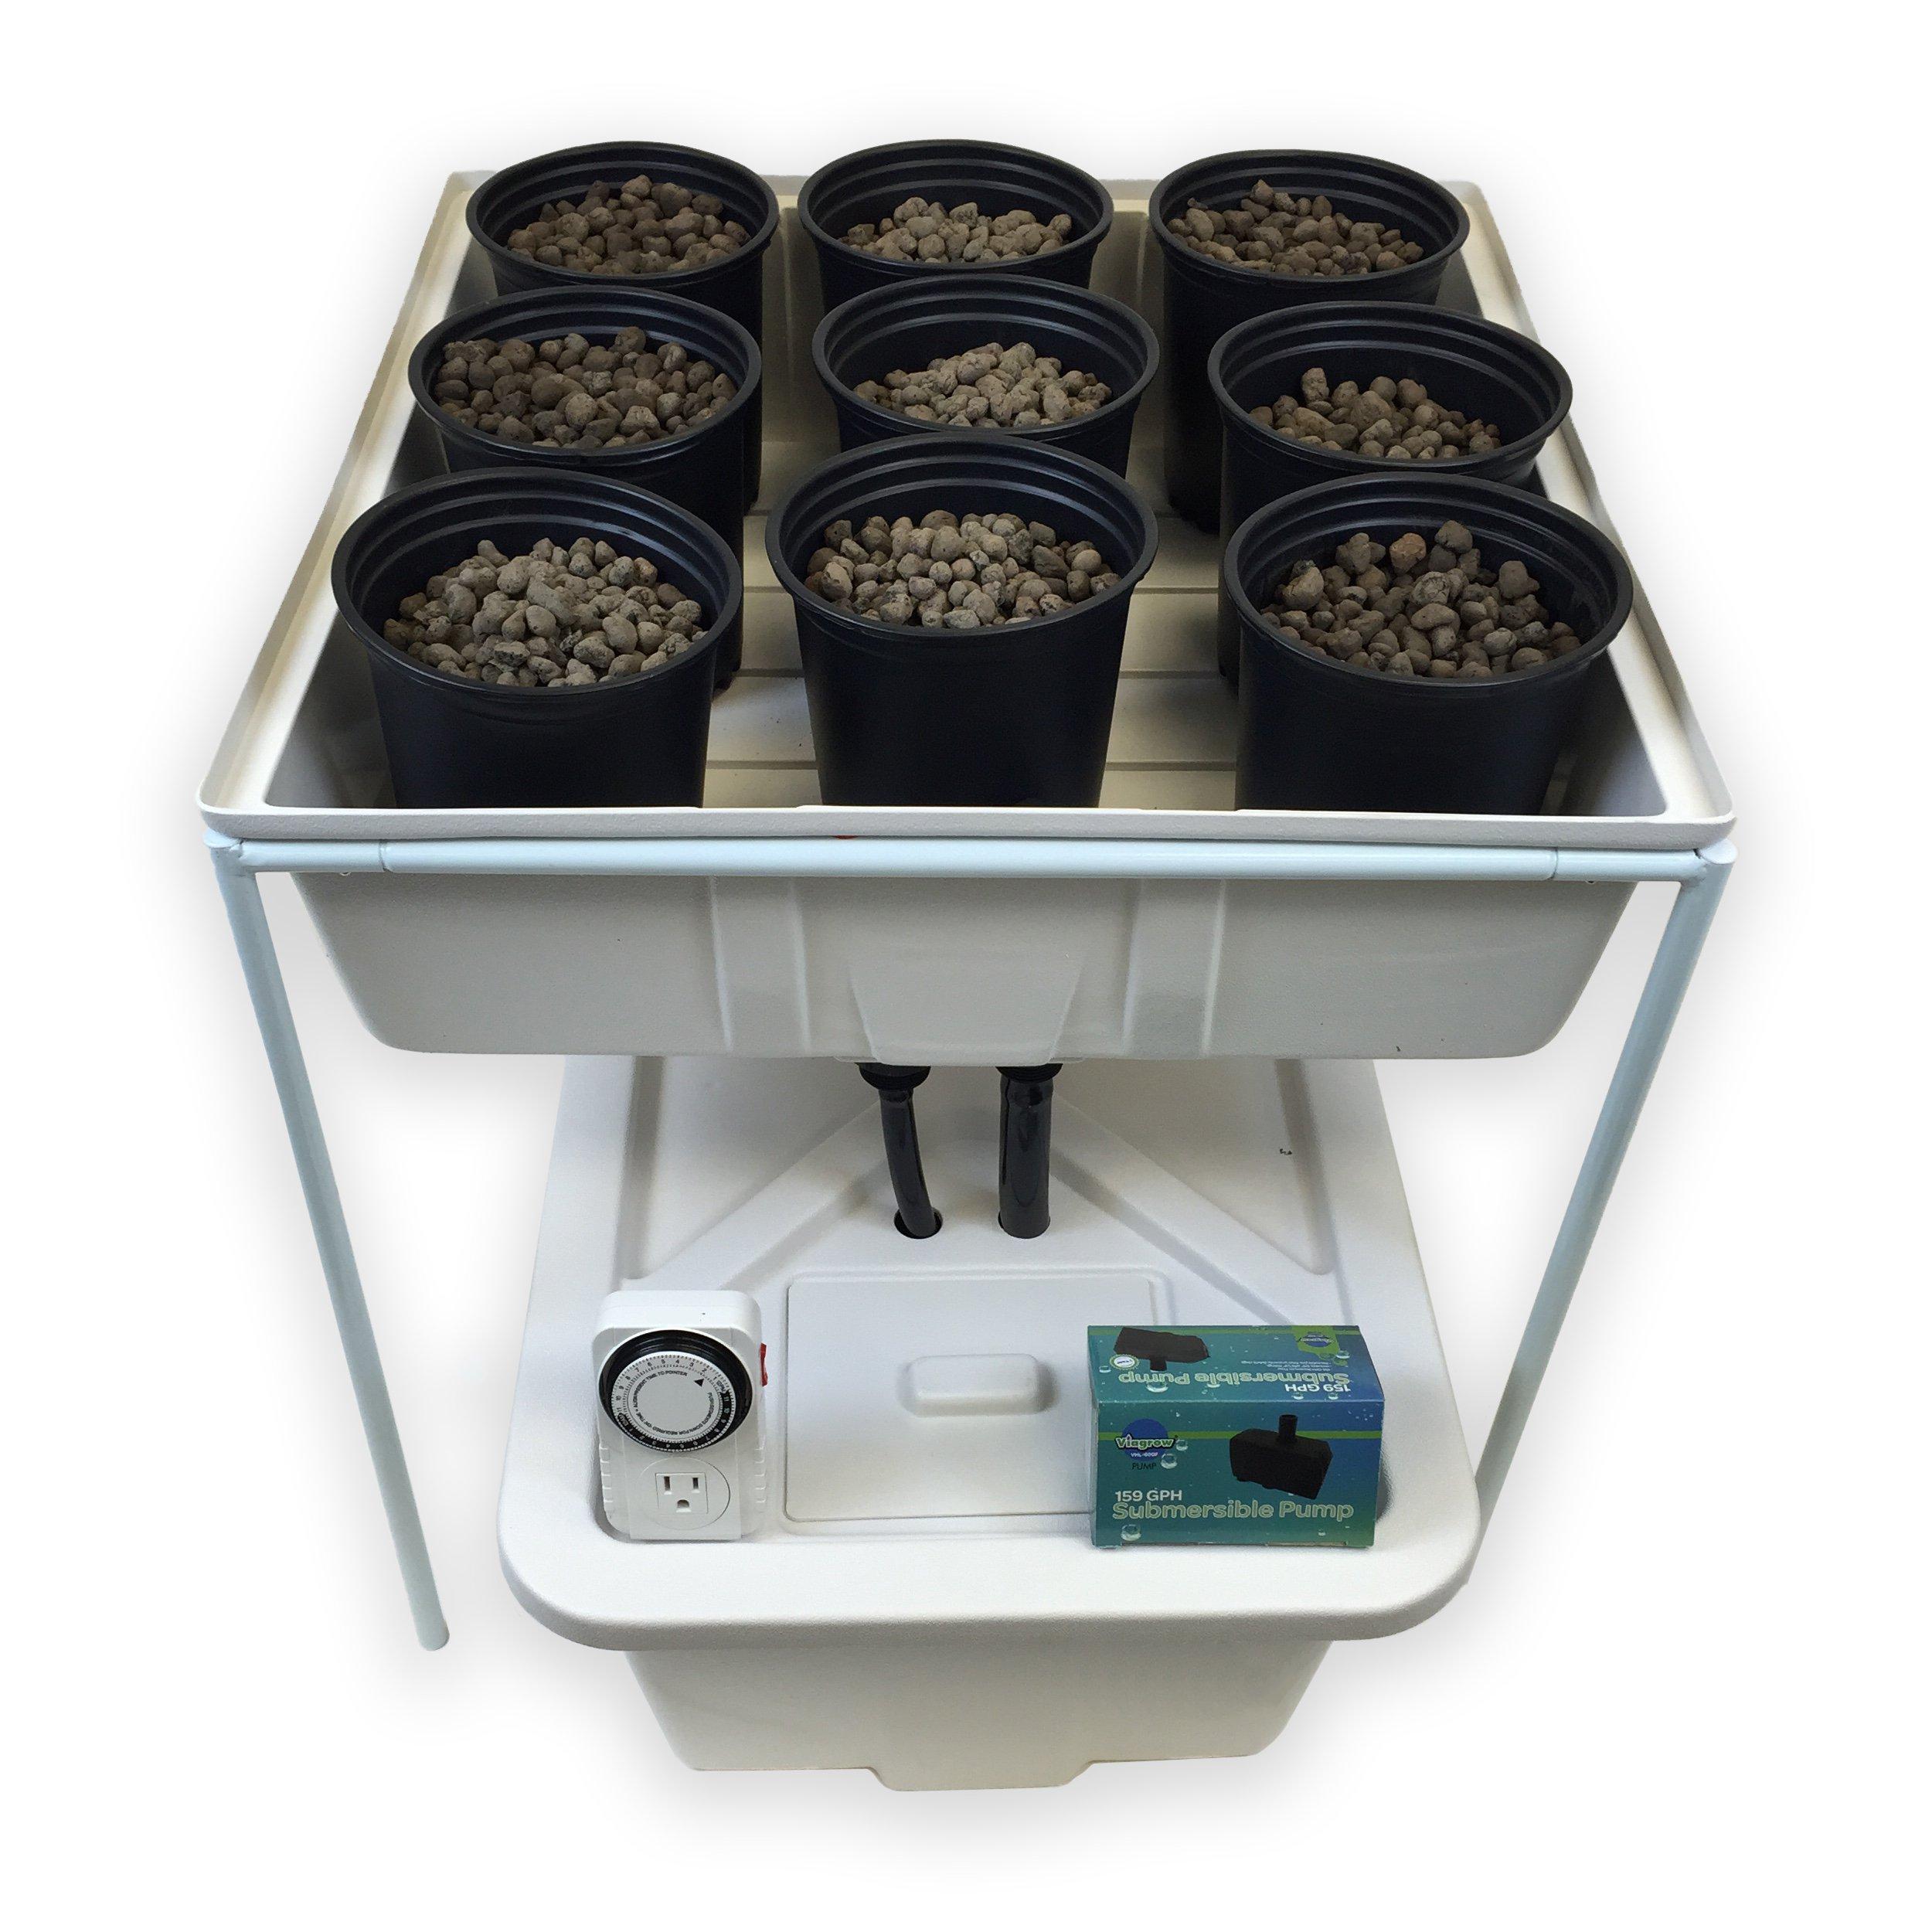 Viagrow Complete 2 ft. x 2 Ft. Ebb & Flow Hydroponics System